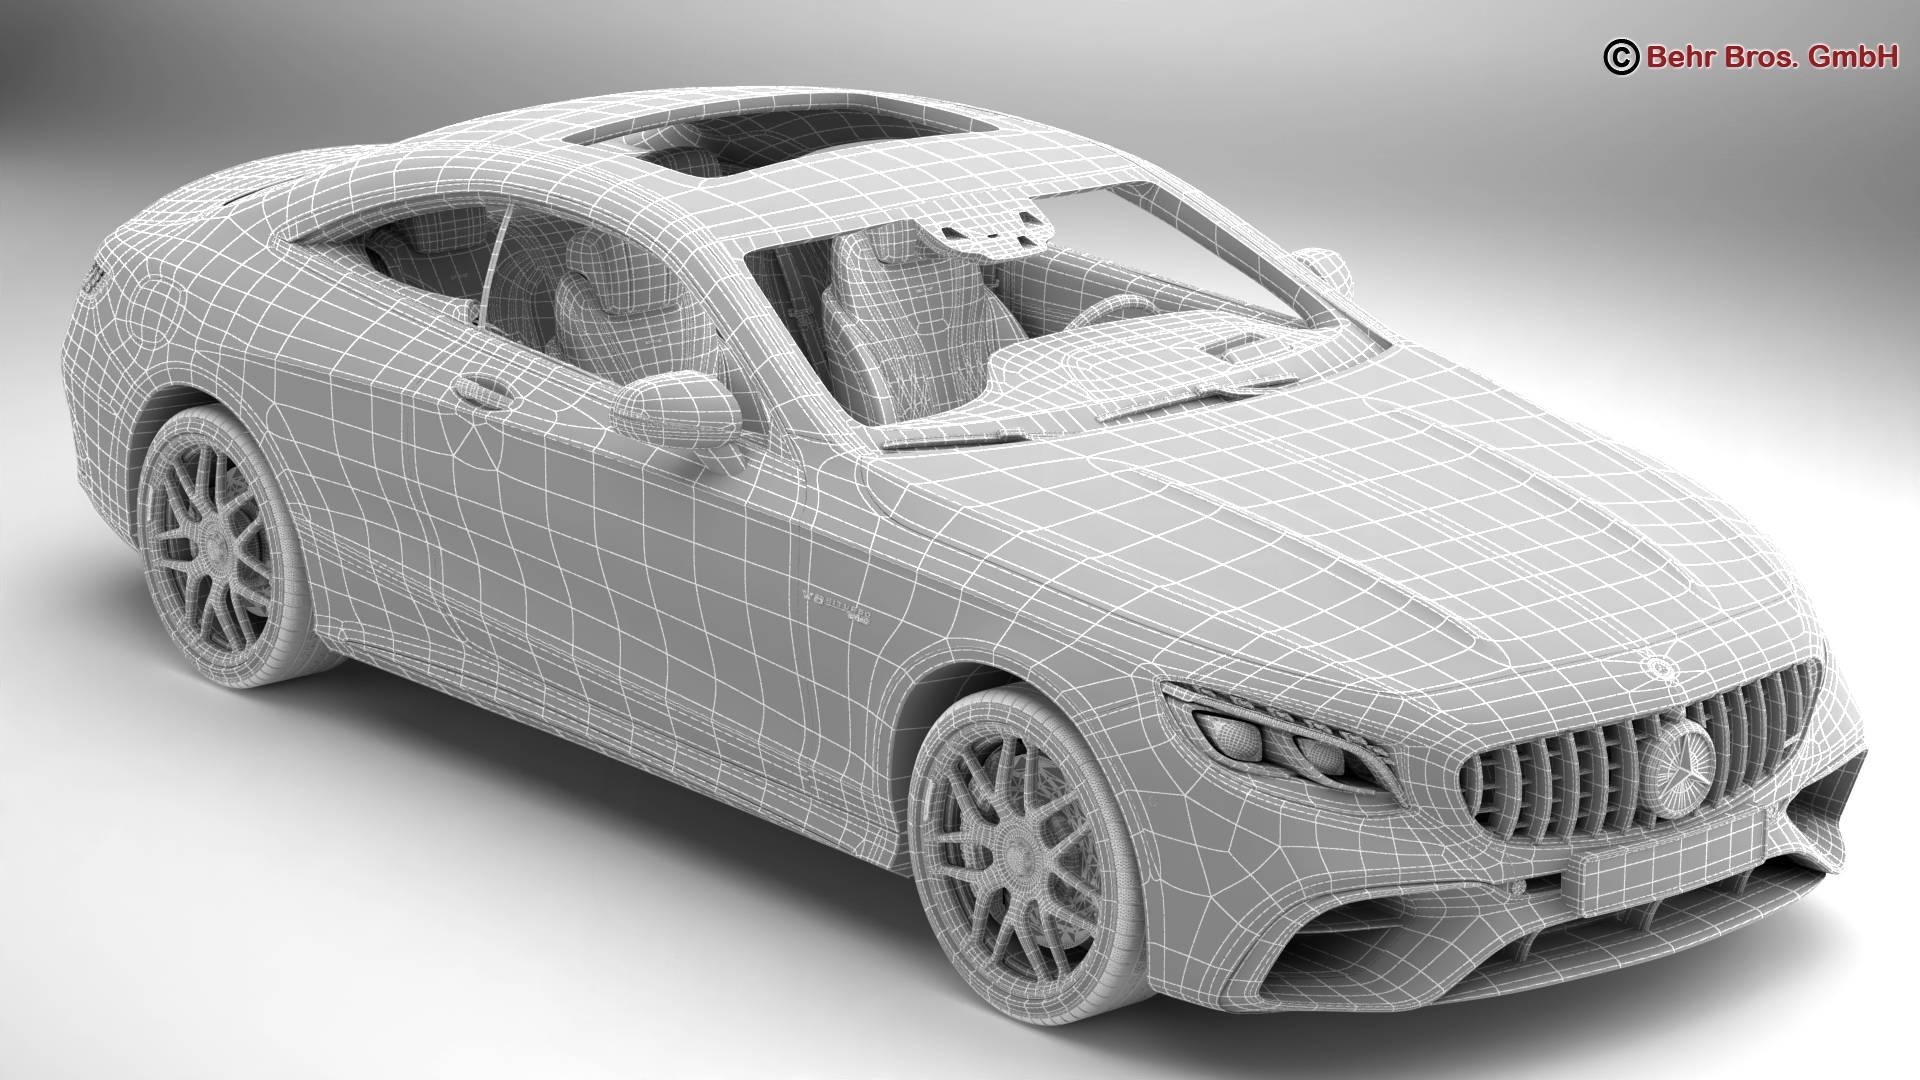 mercedes s class coupe amg s63 2018 3d model 3ds max fbx c4d lwo ma mb obj 274104